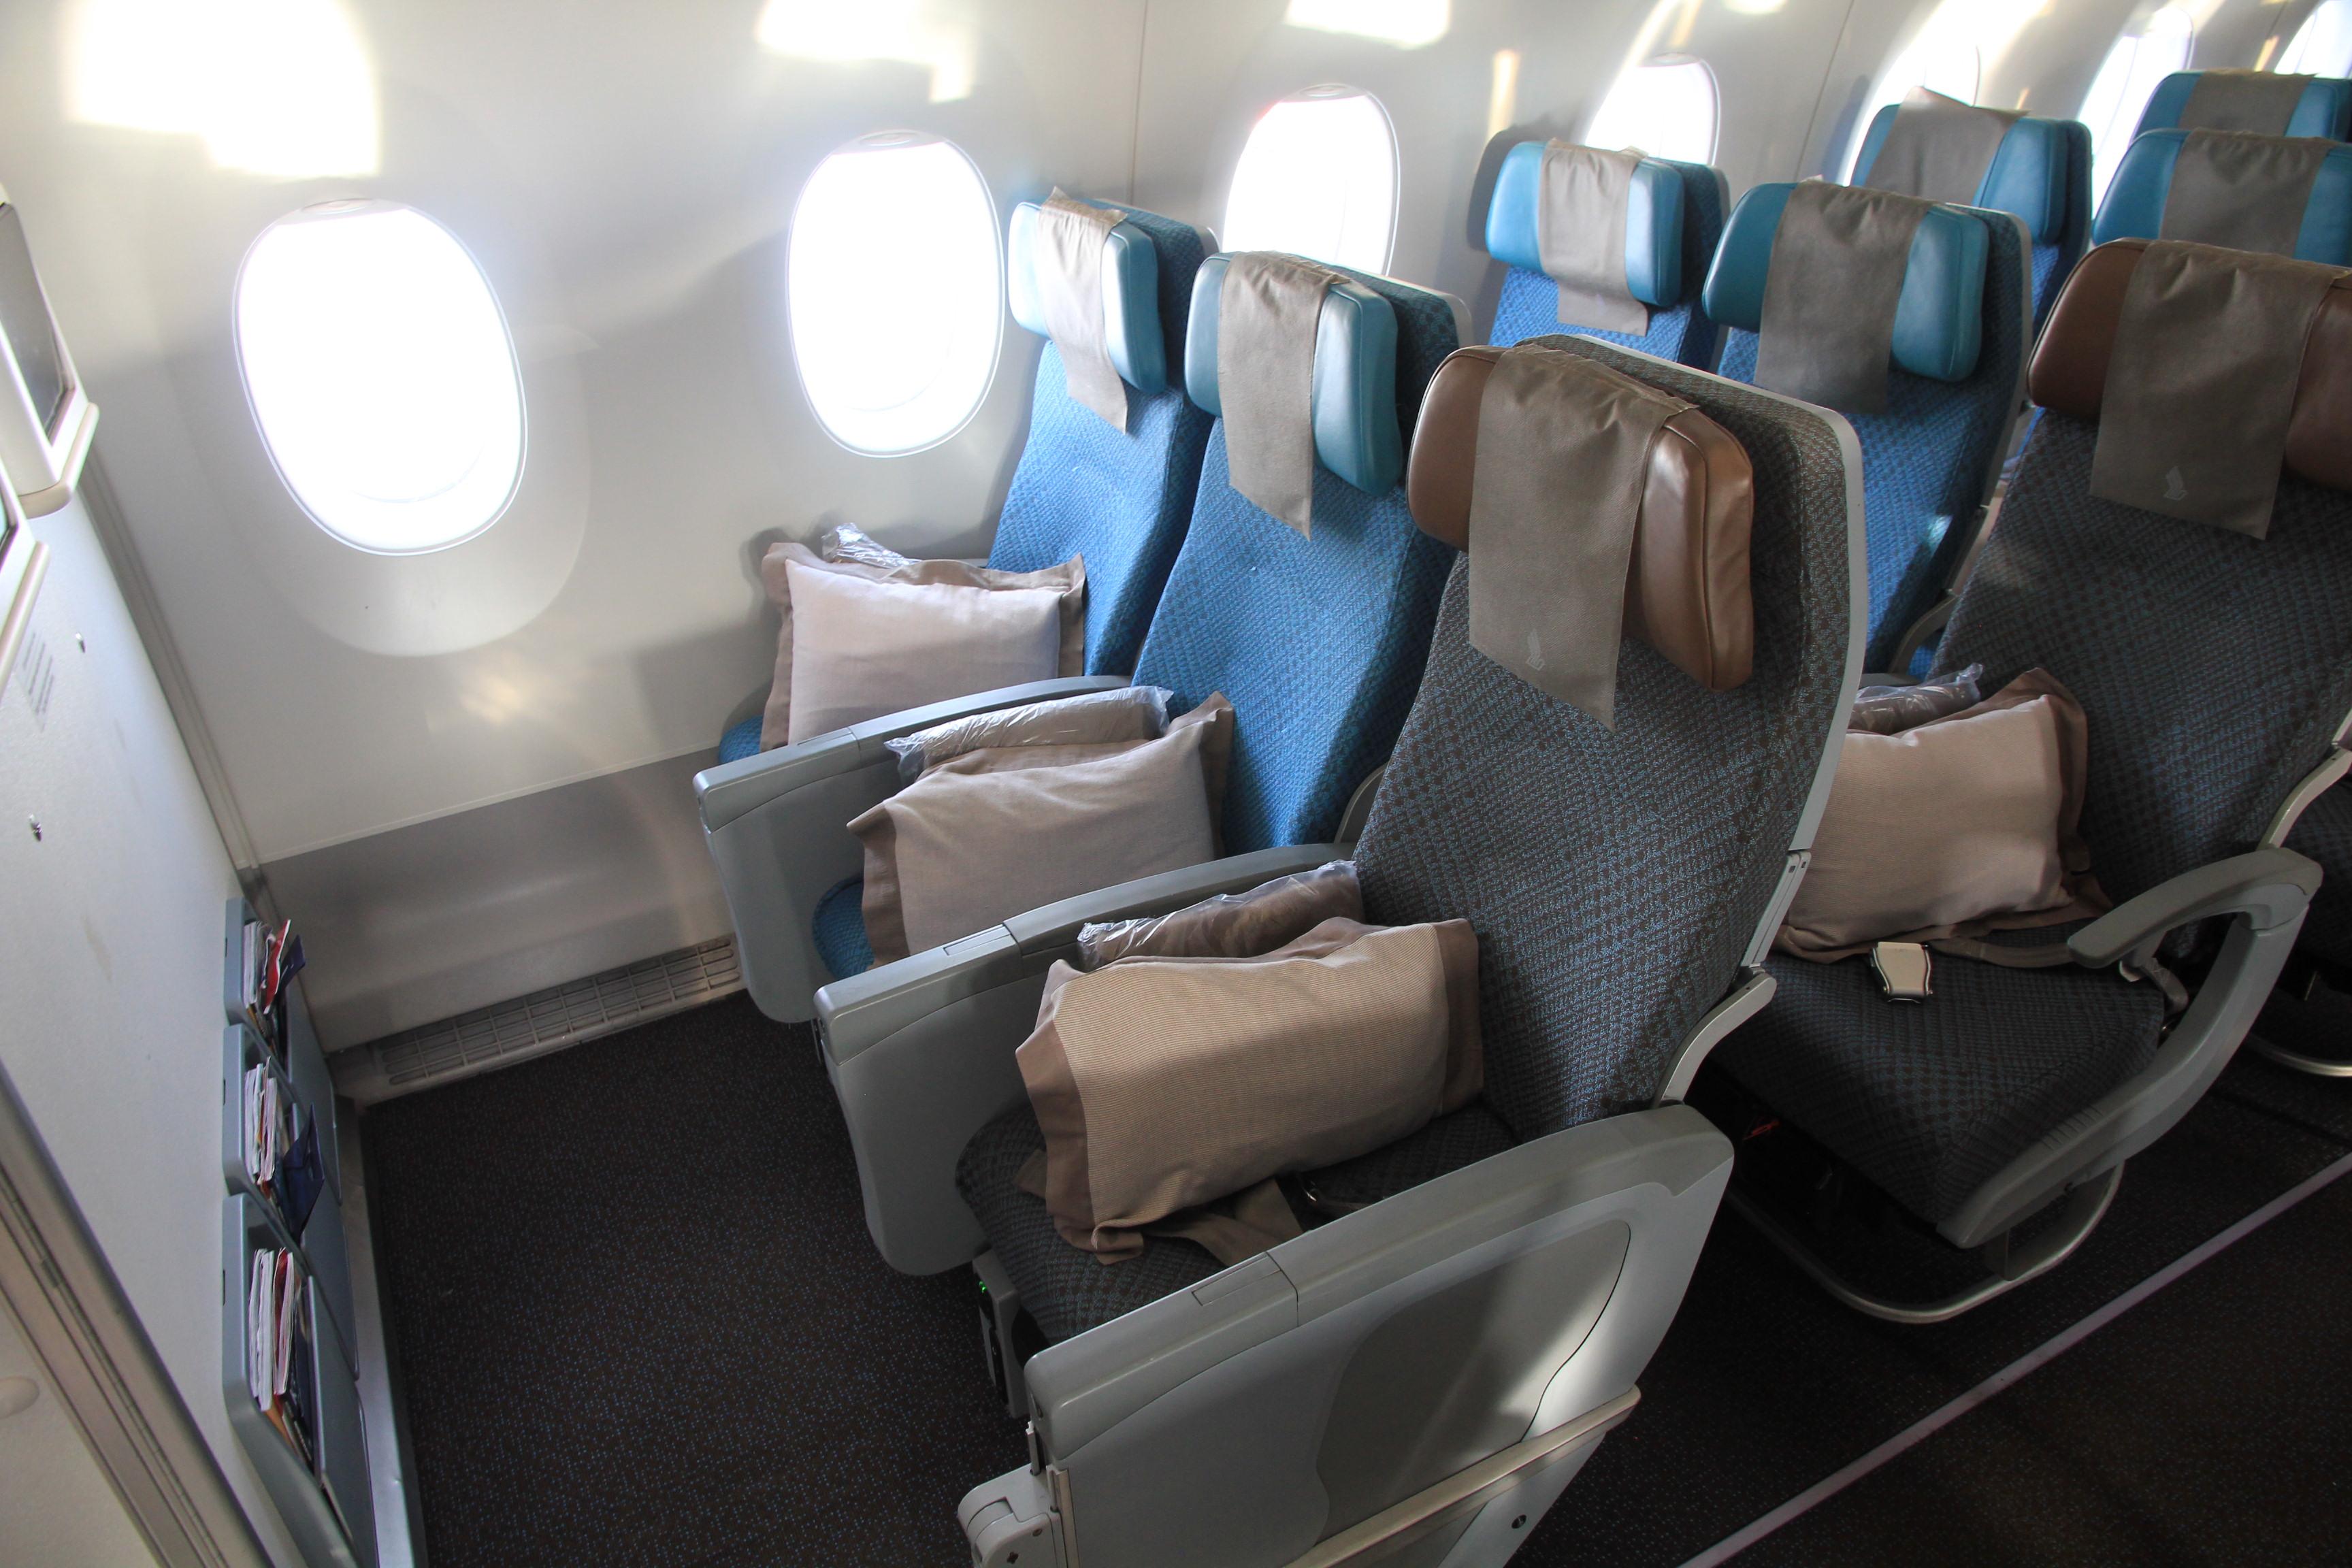 singapore airlines business class im airbus a350 die kabine von stockholm nach moskau. Black Bedroom Furniture Sets. Home Design Ideas